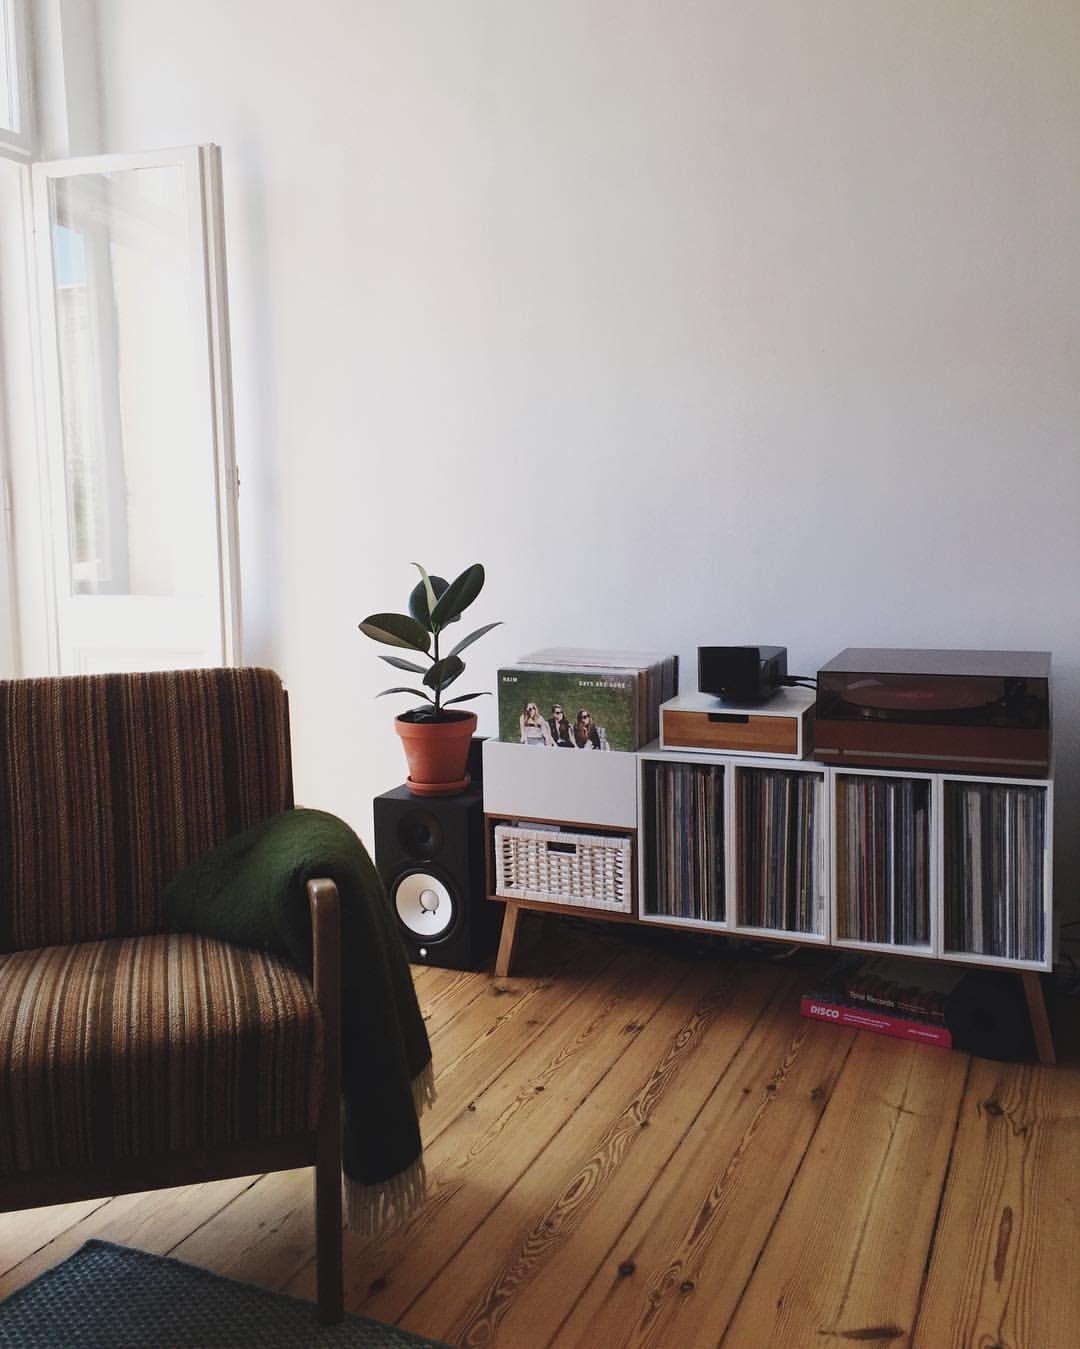 Cozy House Entryway: Pin By Courtney Botha On Decor Ideas